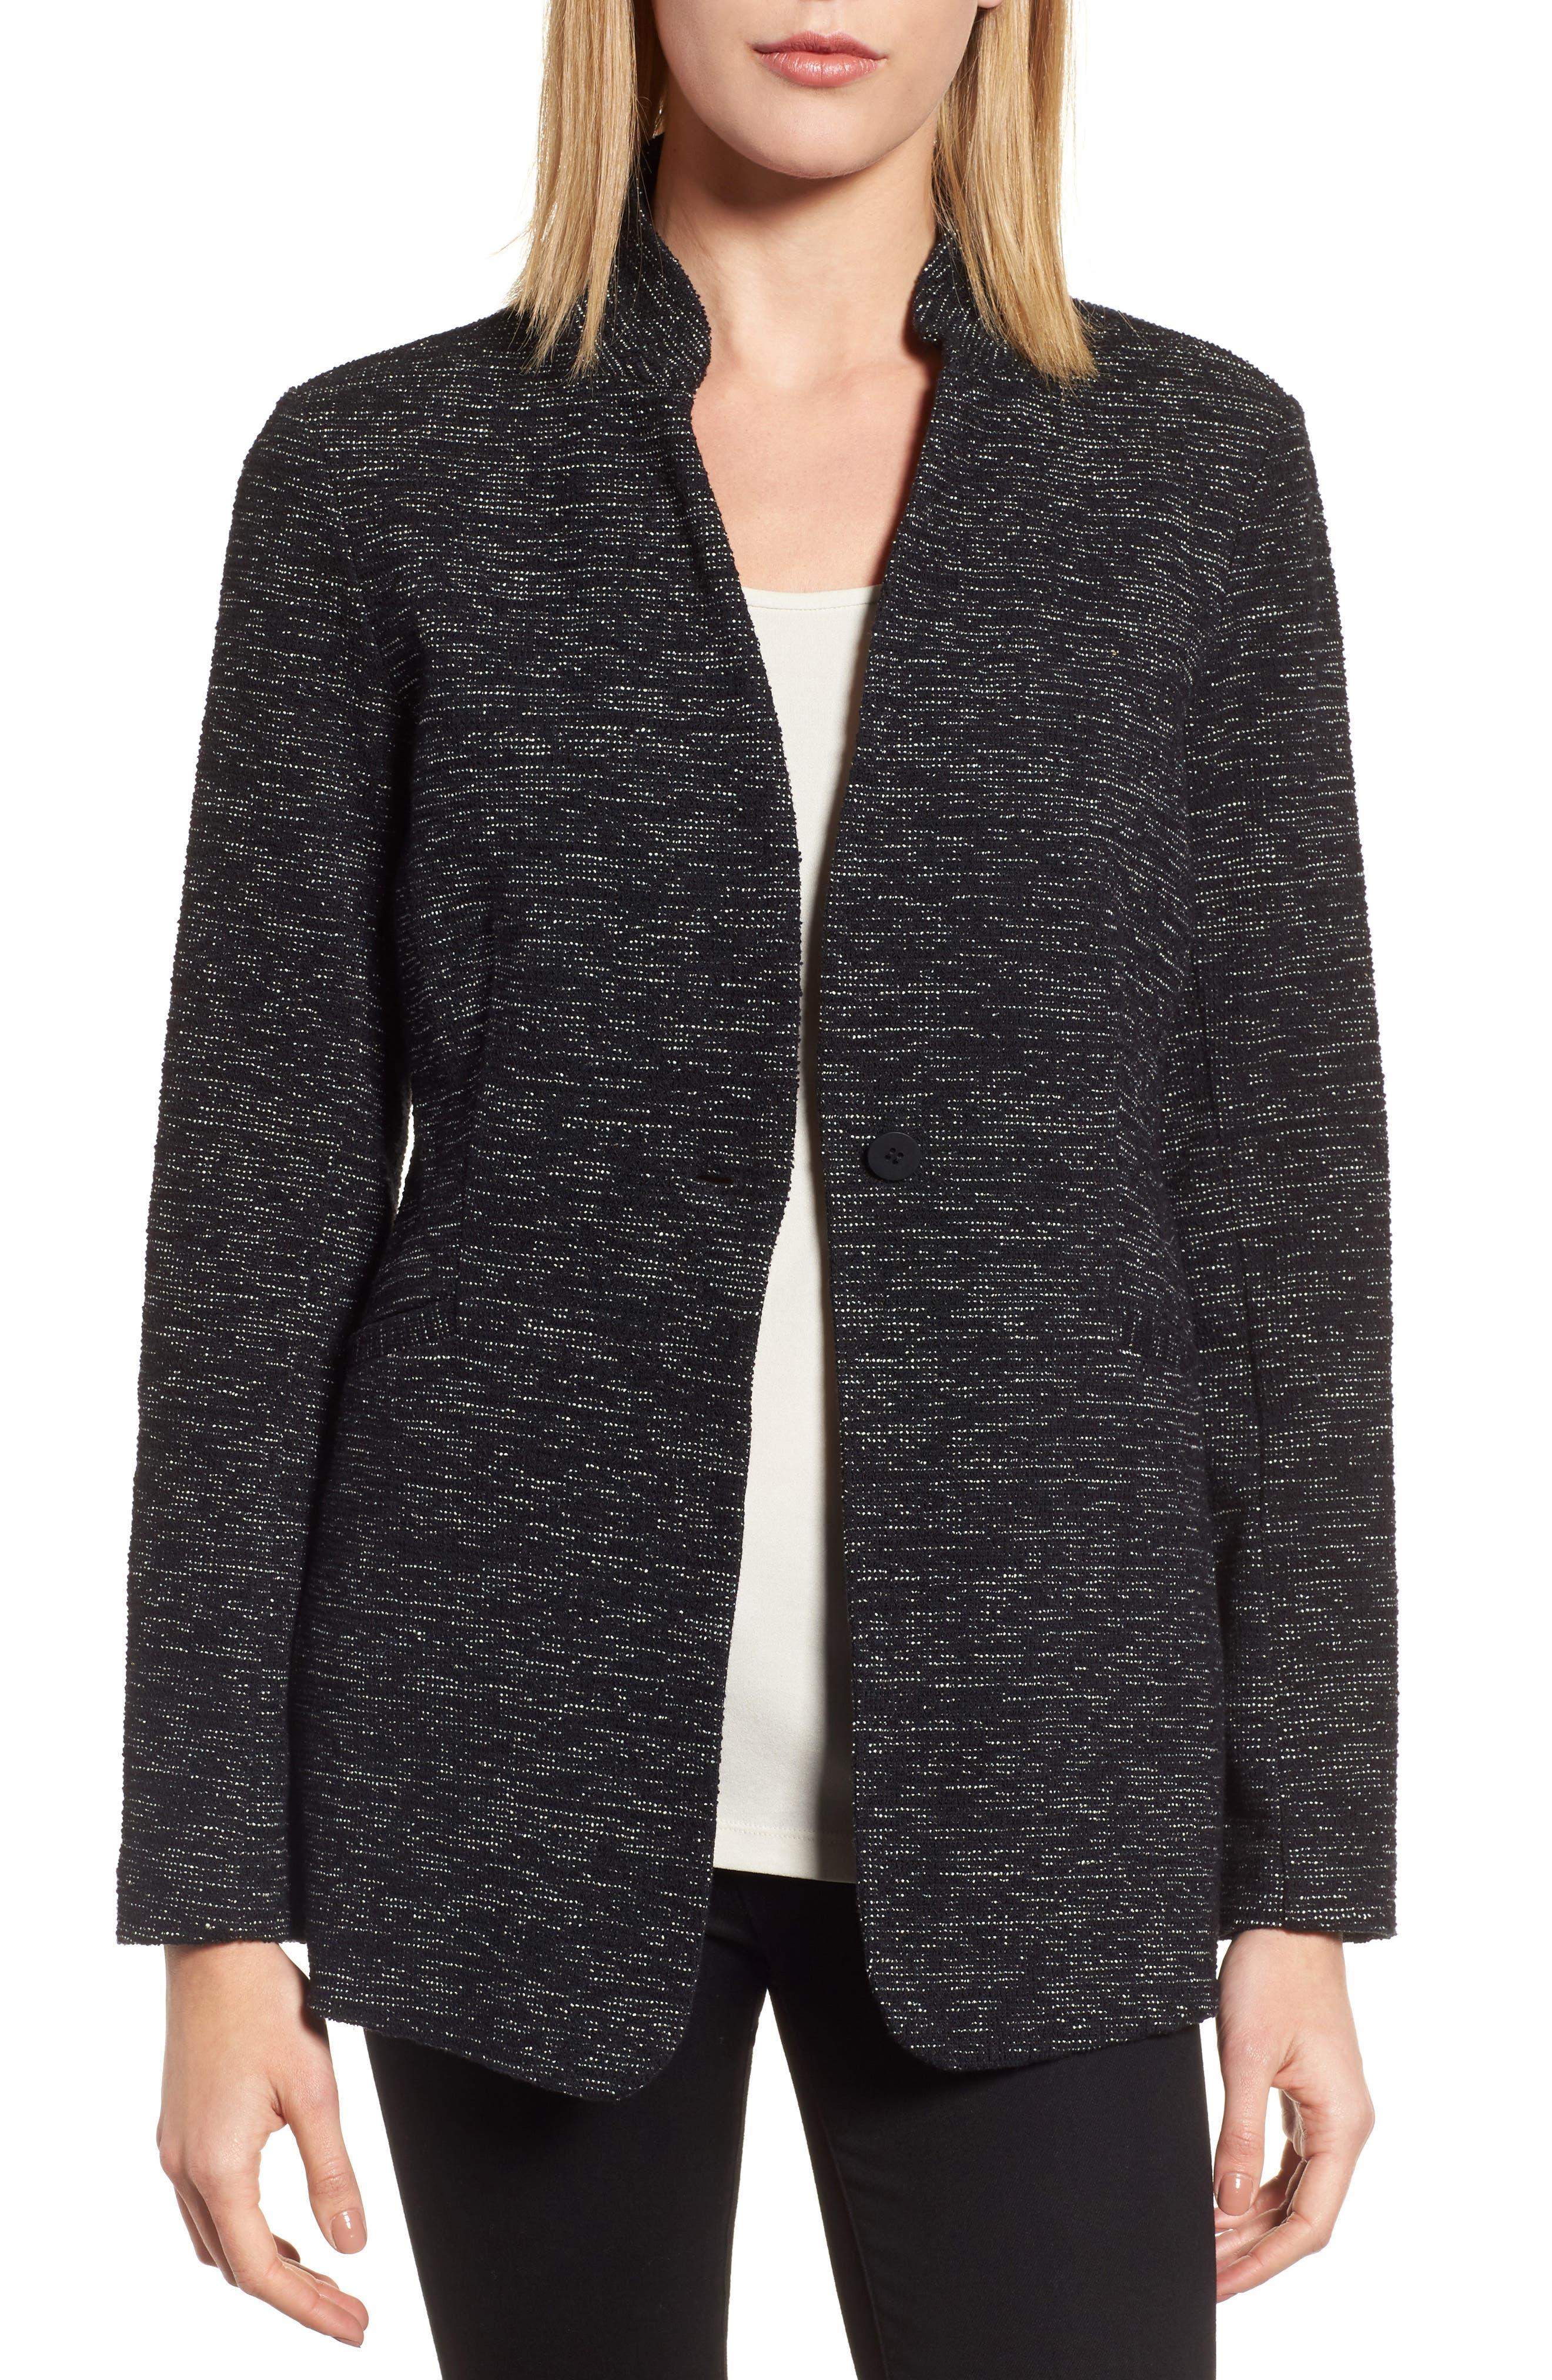 Alternate Image 1 Selected - Eileen Fisher Organic Cotton Blend Tweed Jacket